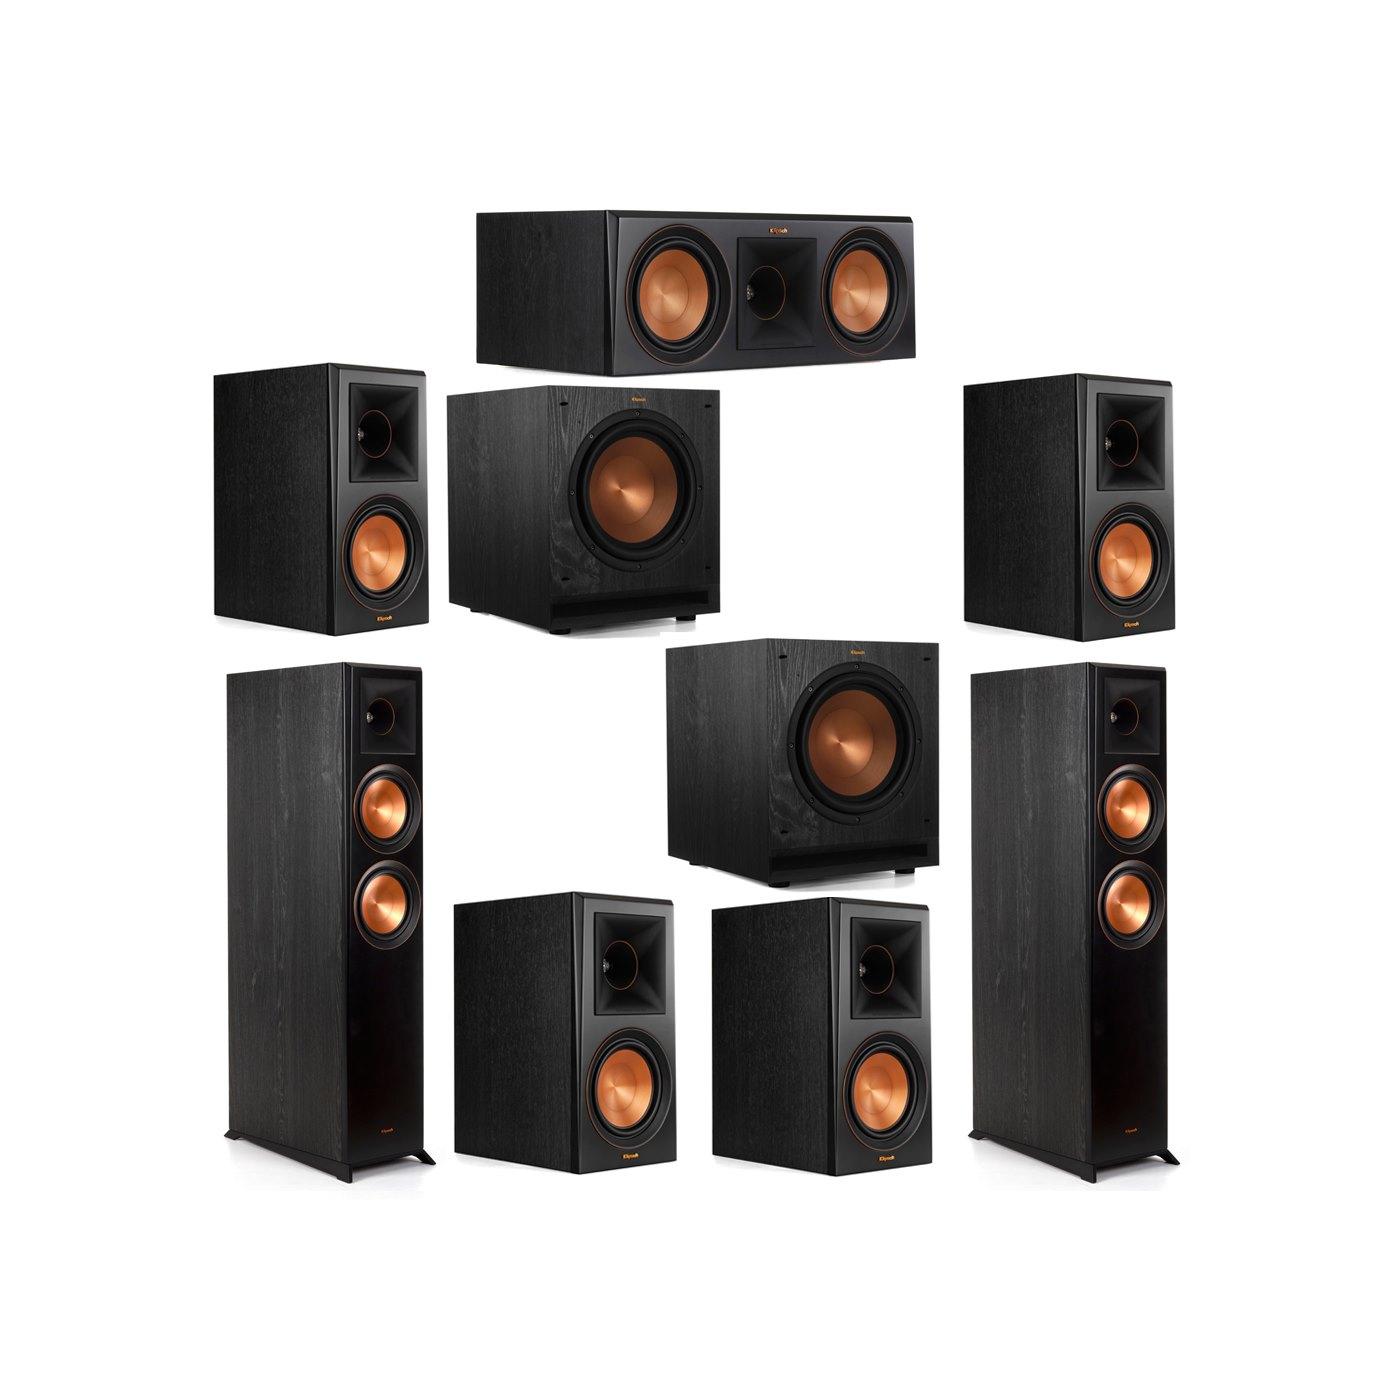 Klipsch 7.2 System with 2 RP-6000F Floorstanding Speakers, 1 Klipsch RP-600C Center Speaker, 4 Klipsch RP-600M Surround Speakers, 2 Klipsch SPL-100 Subwoofers